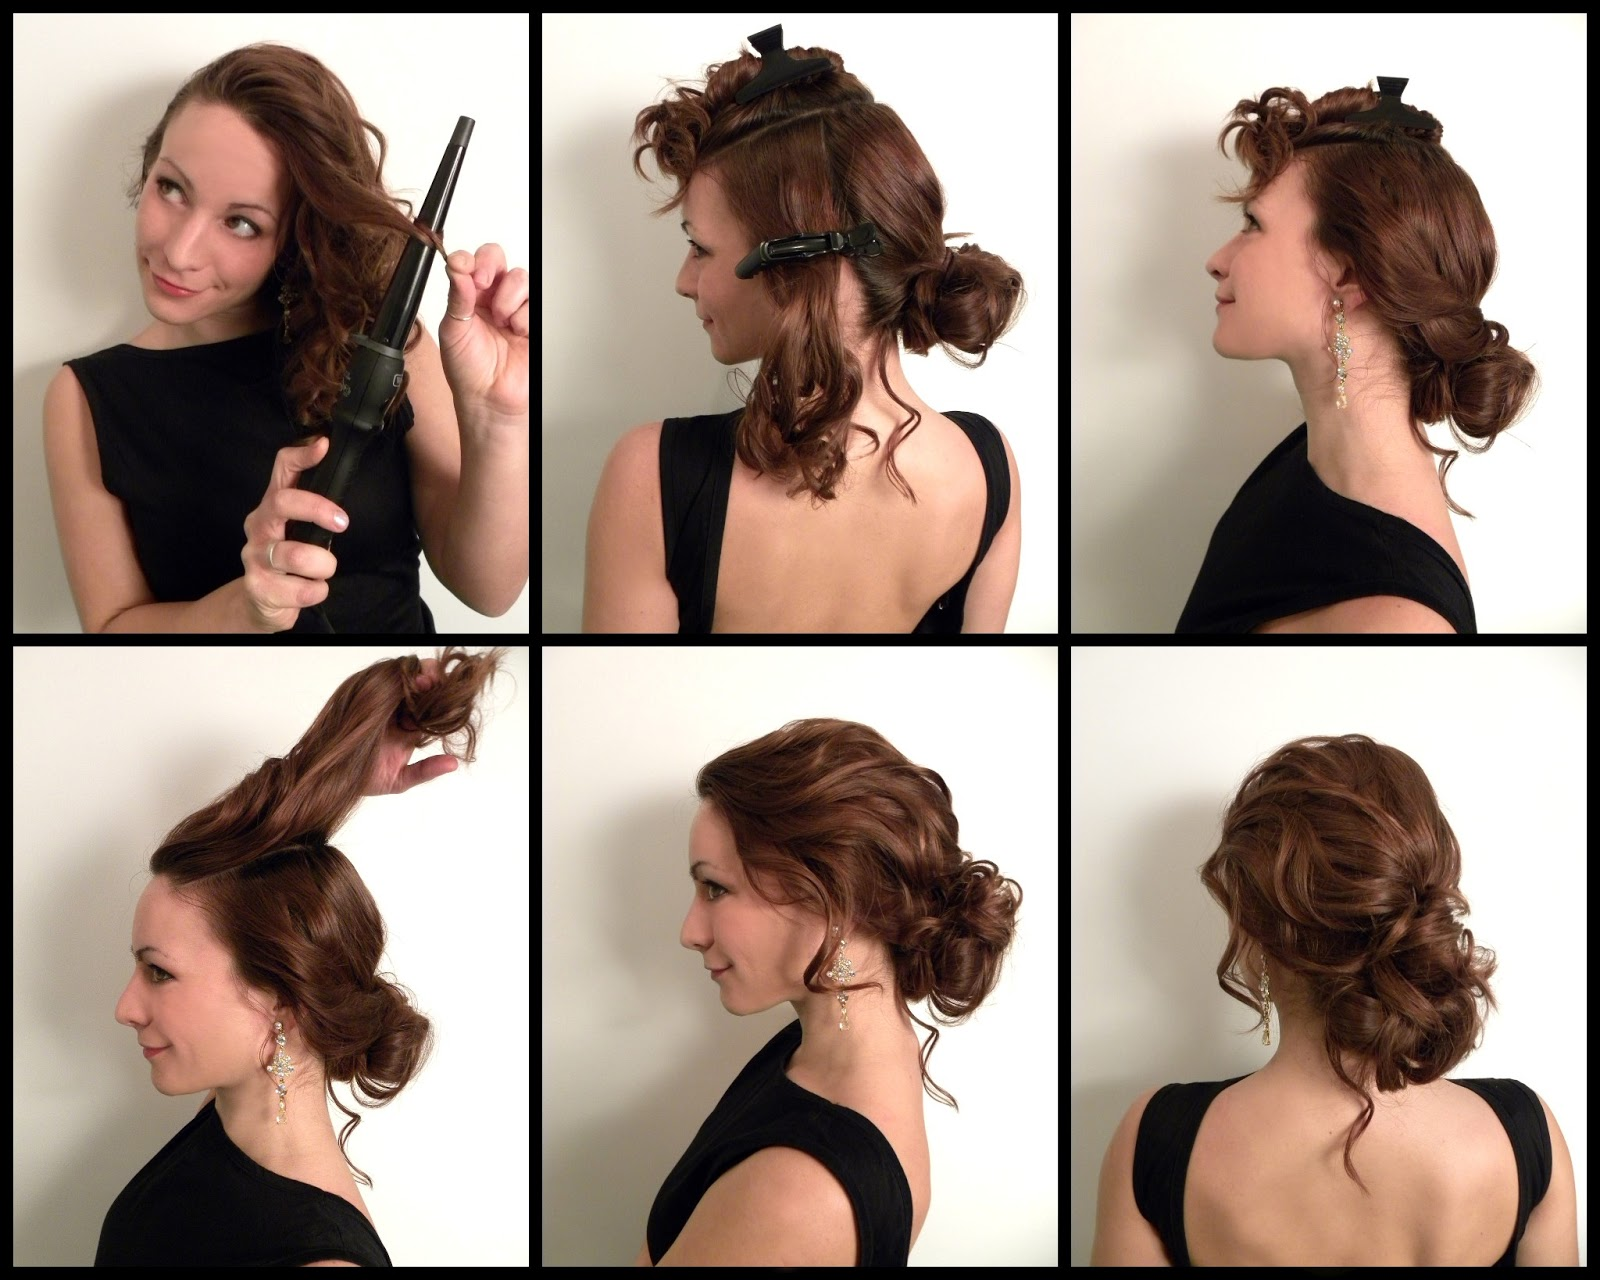 Причёски пошагово в домашних условиях своими руками фото